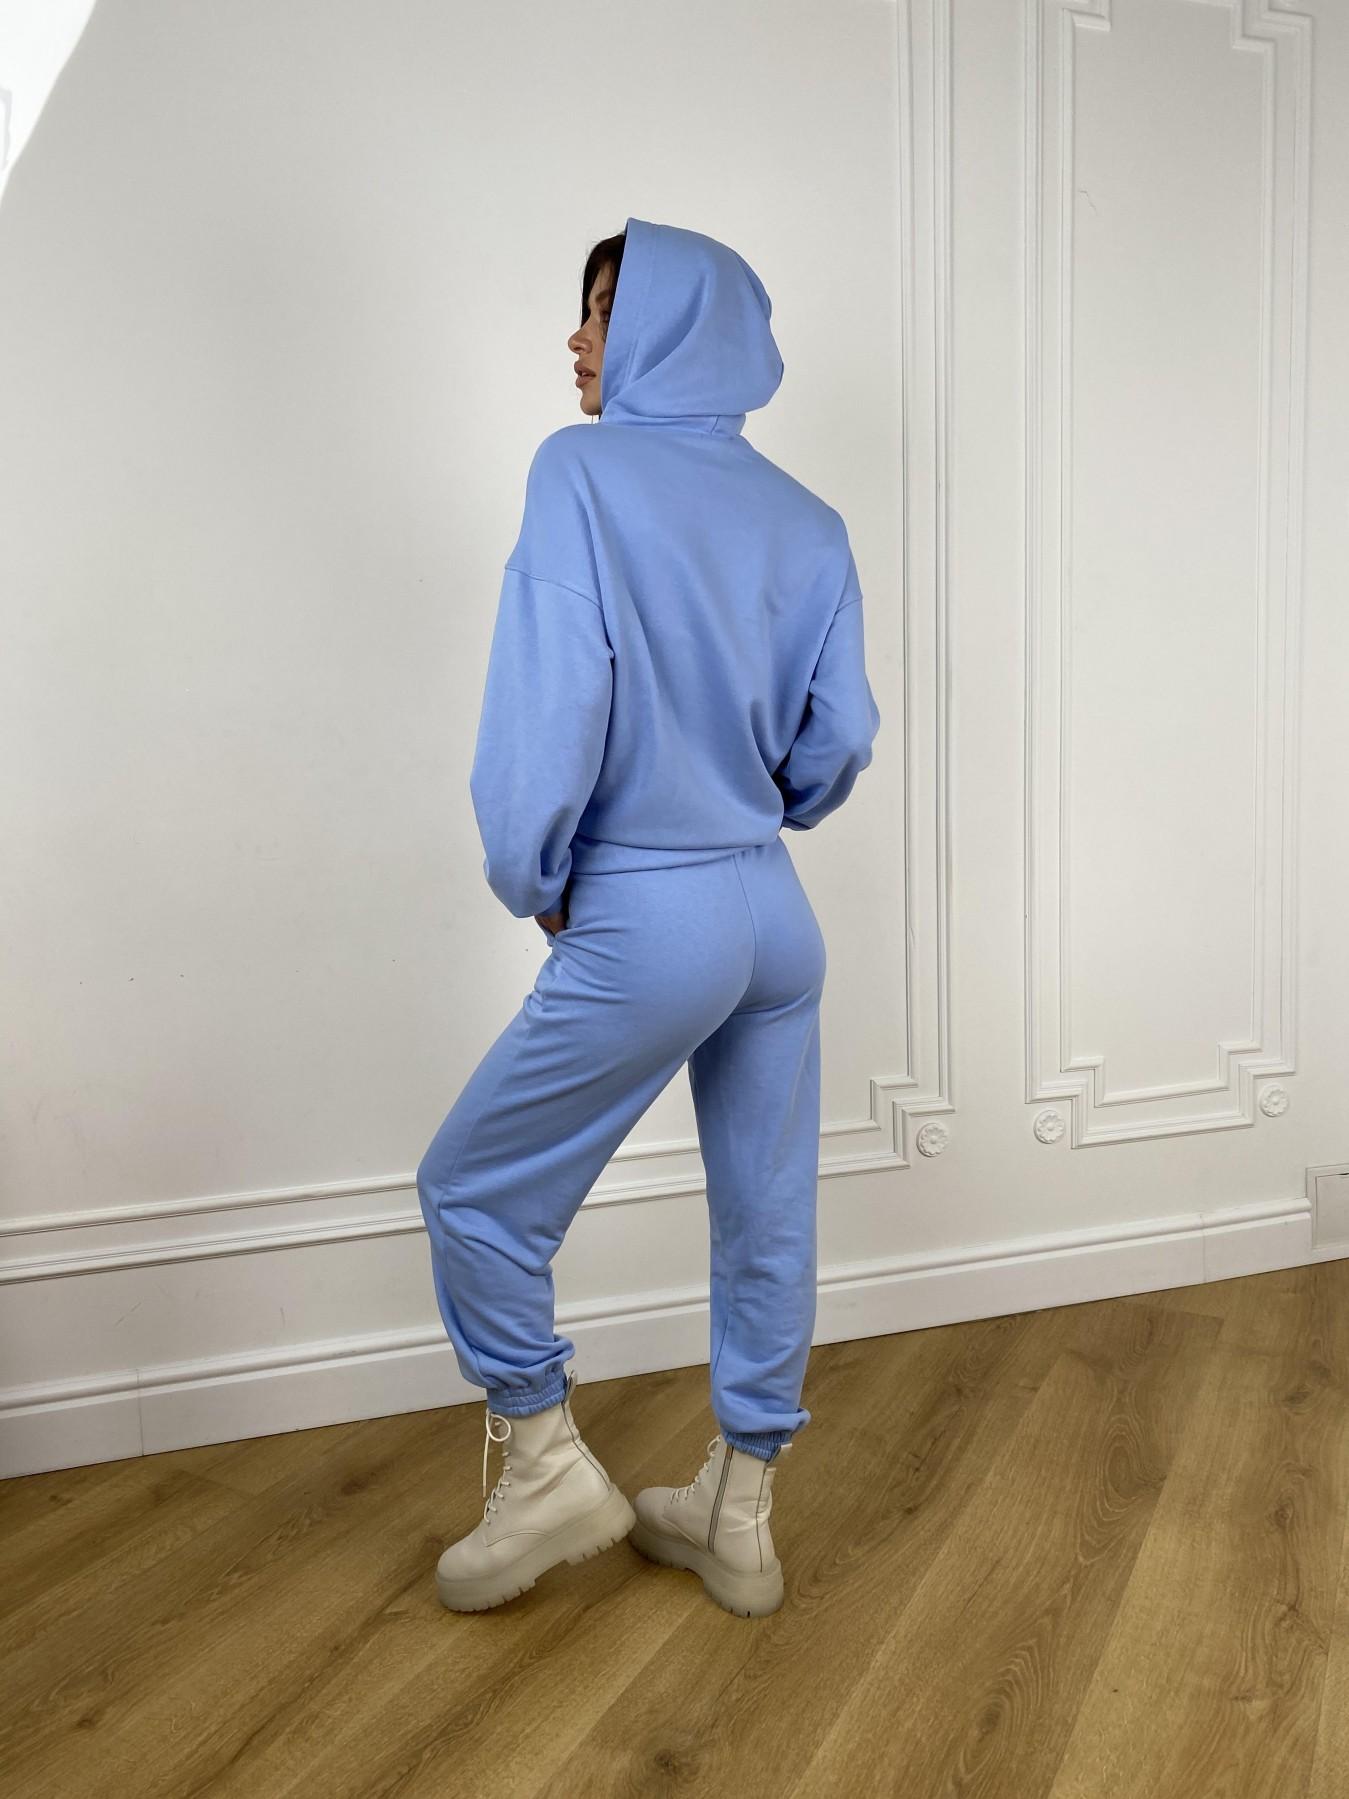 Марион костюм из 3х нитки 10581 АРТ. 46937 Цвет: Голубой - фото 5, интернет магазин tm-modus.ru